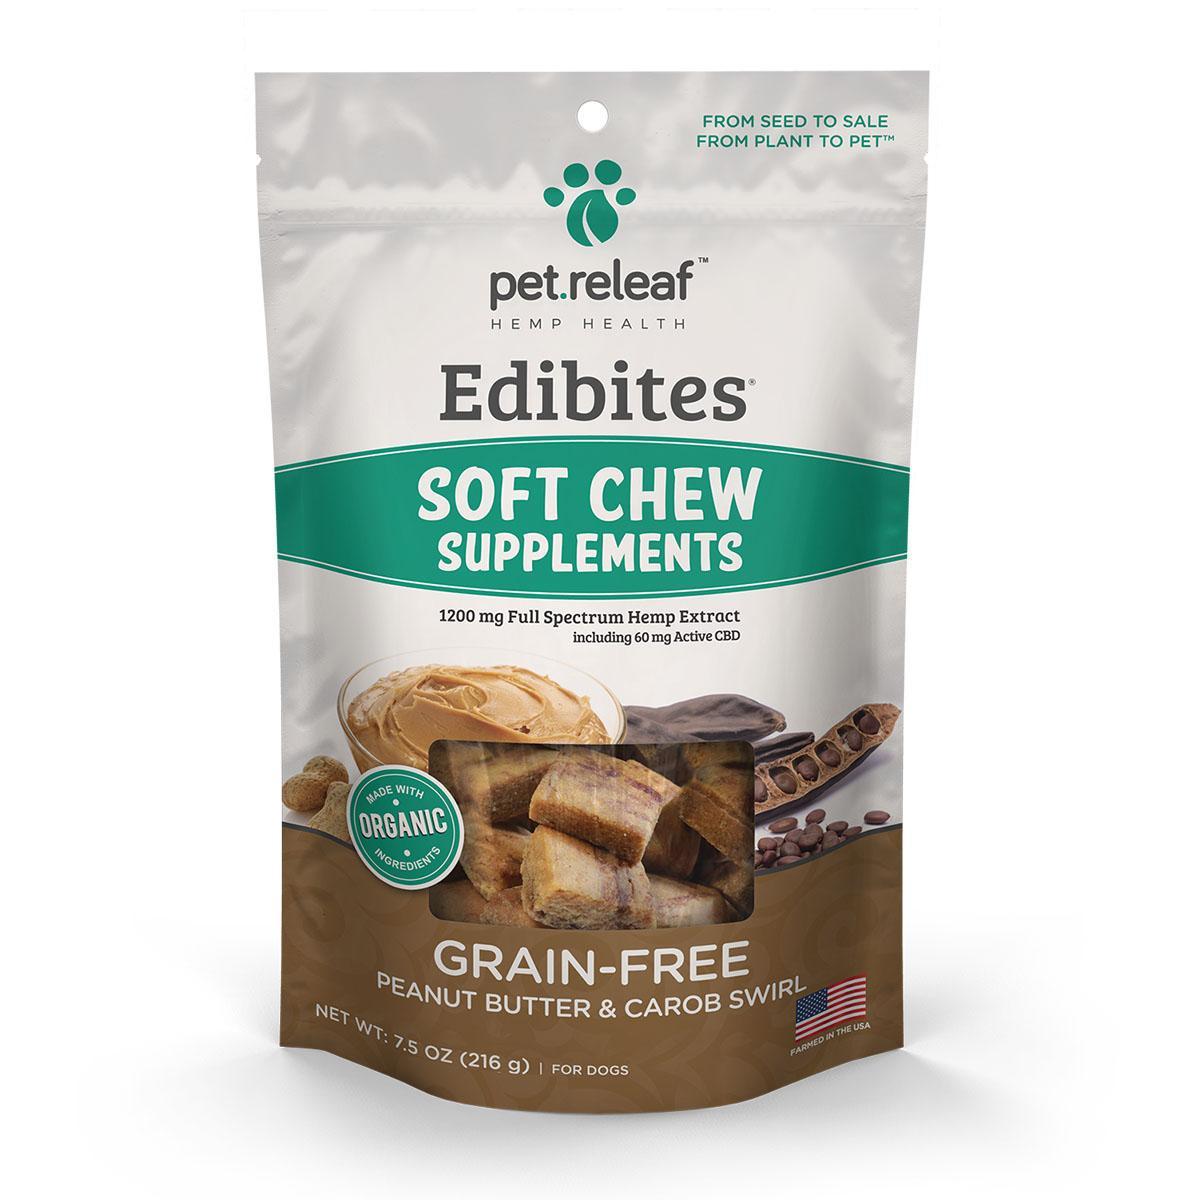 Pet Releaf Edibites Soft Chew Dog Treats - Peanut Butter and Carob Swirl